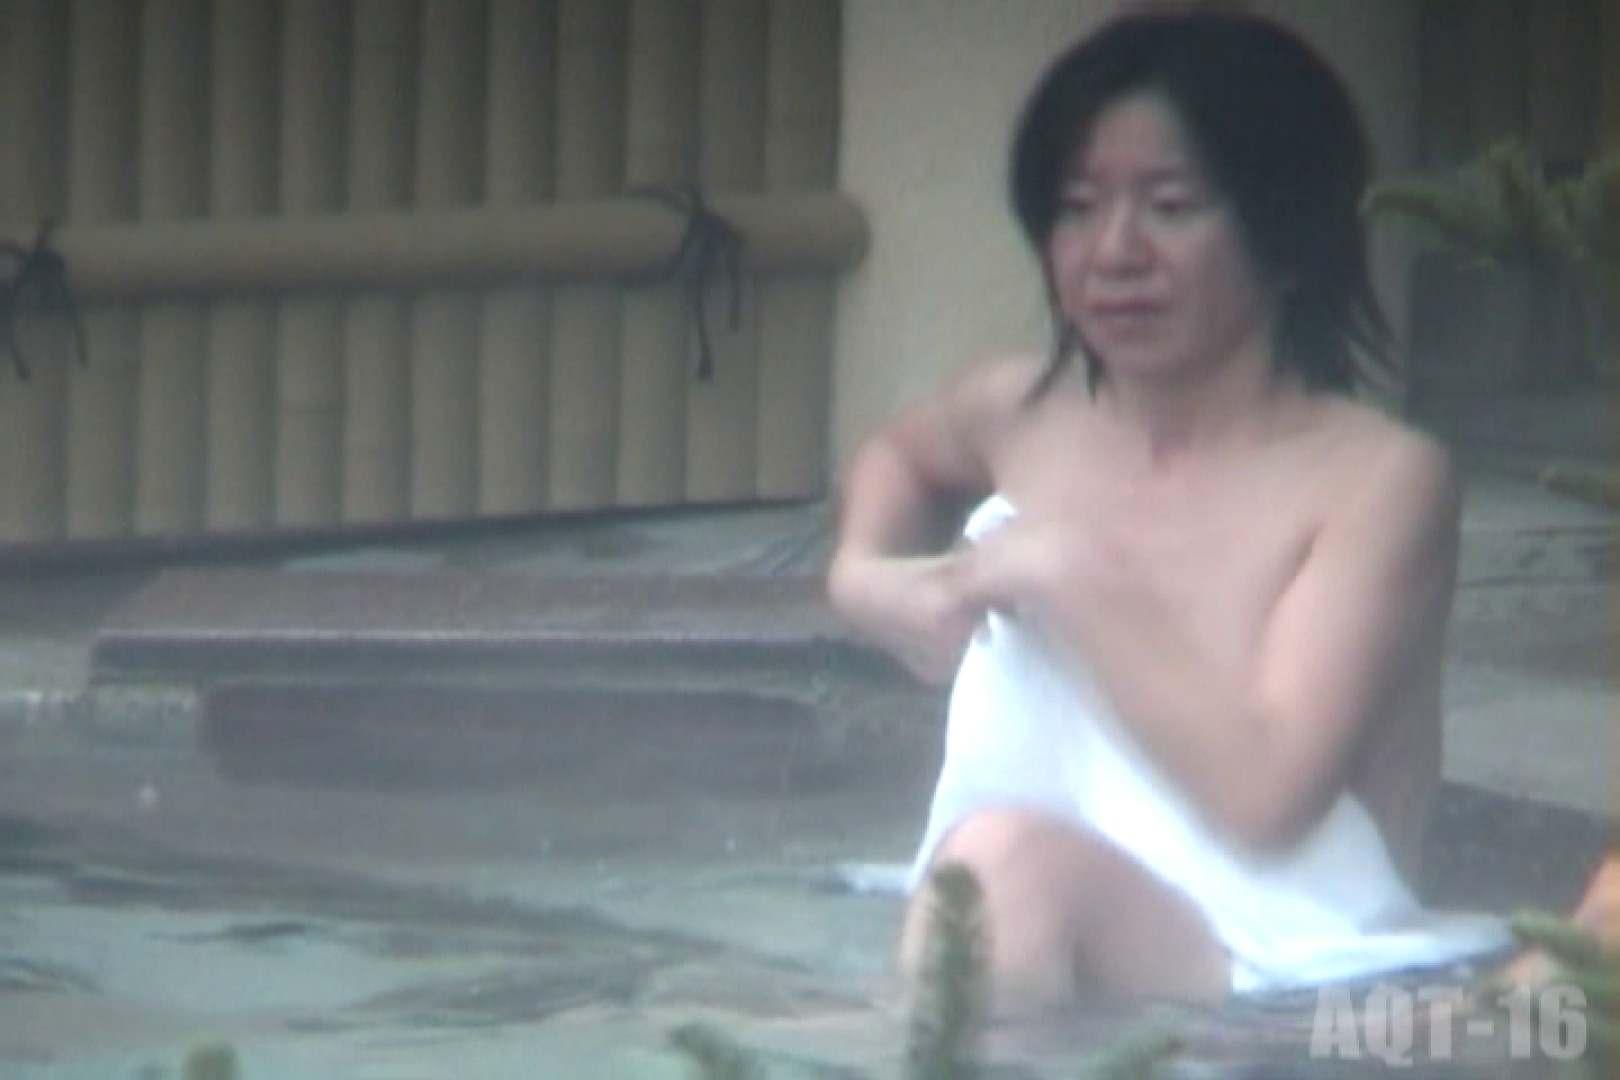 Aquaな露天風呂Vol.841 盗撮師作品 ワレメ動画紹介 77pic 68